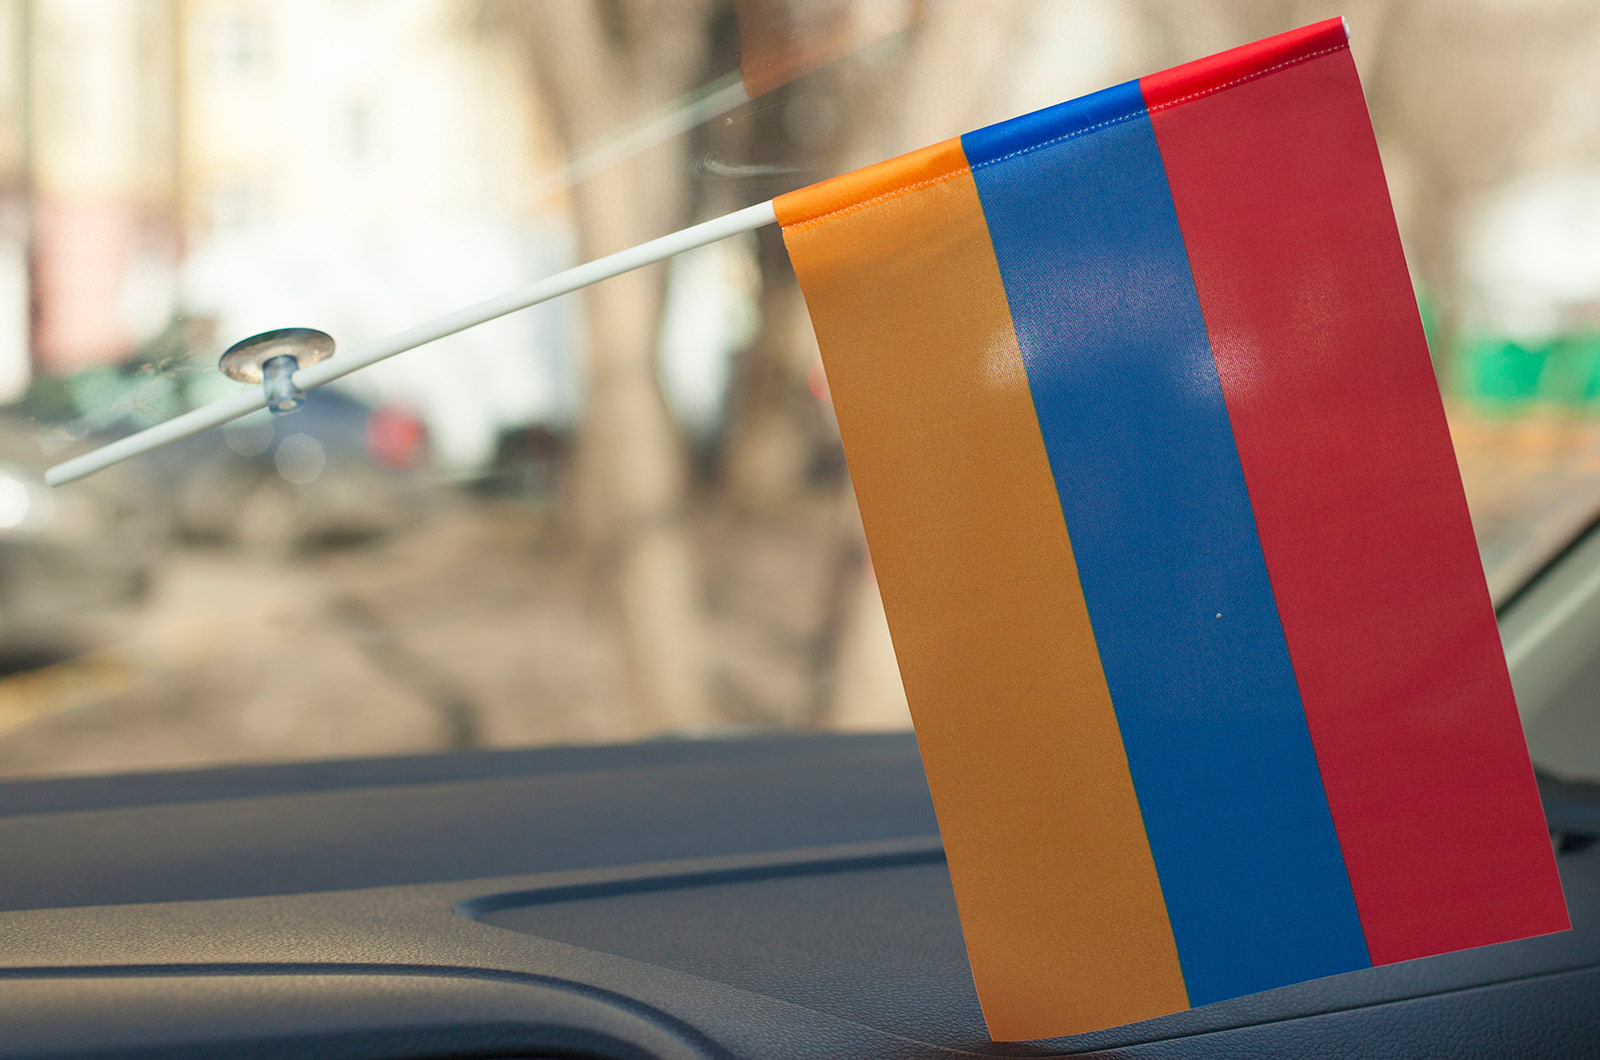 Флажок Армении в машину